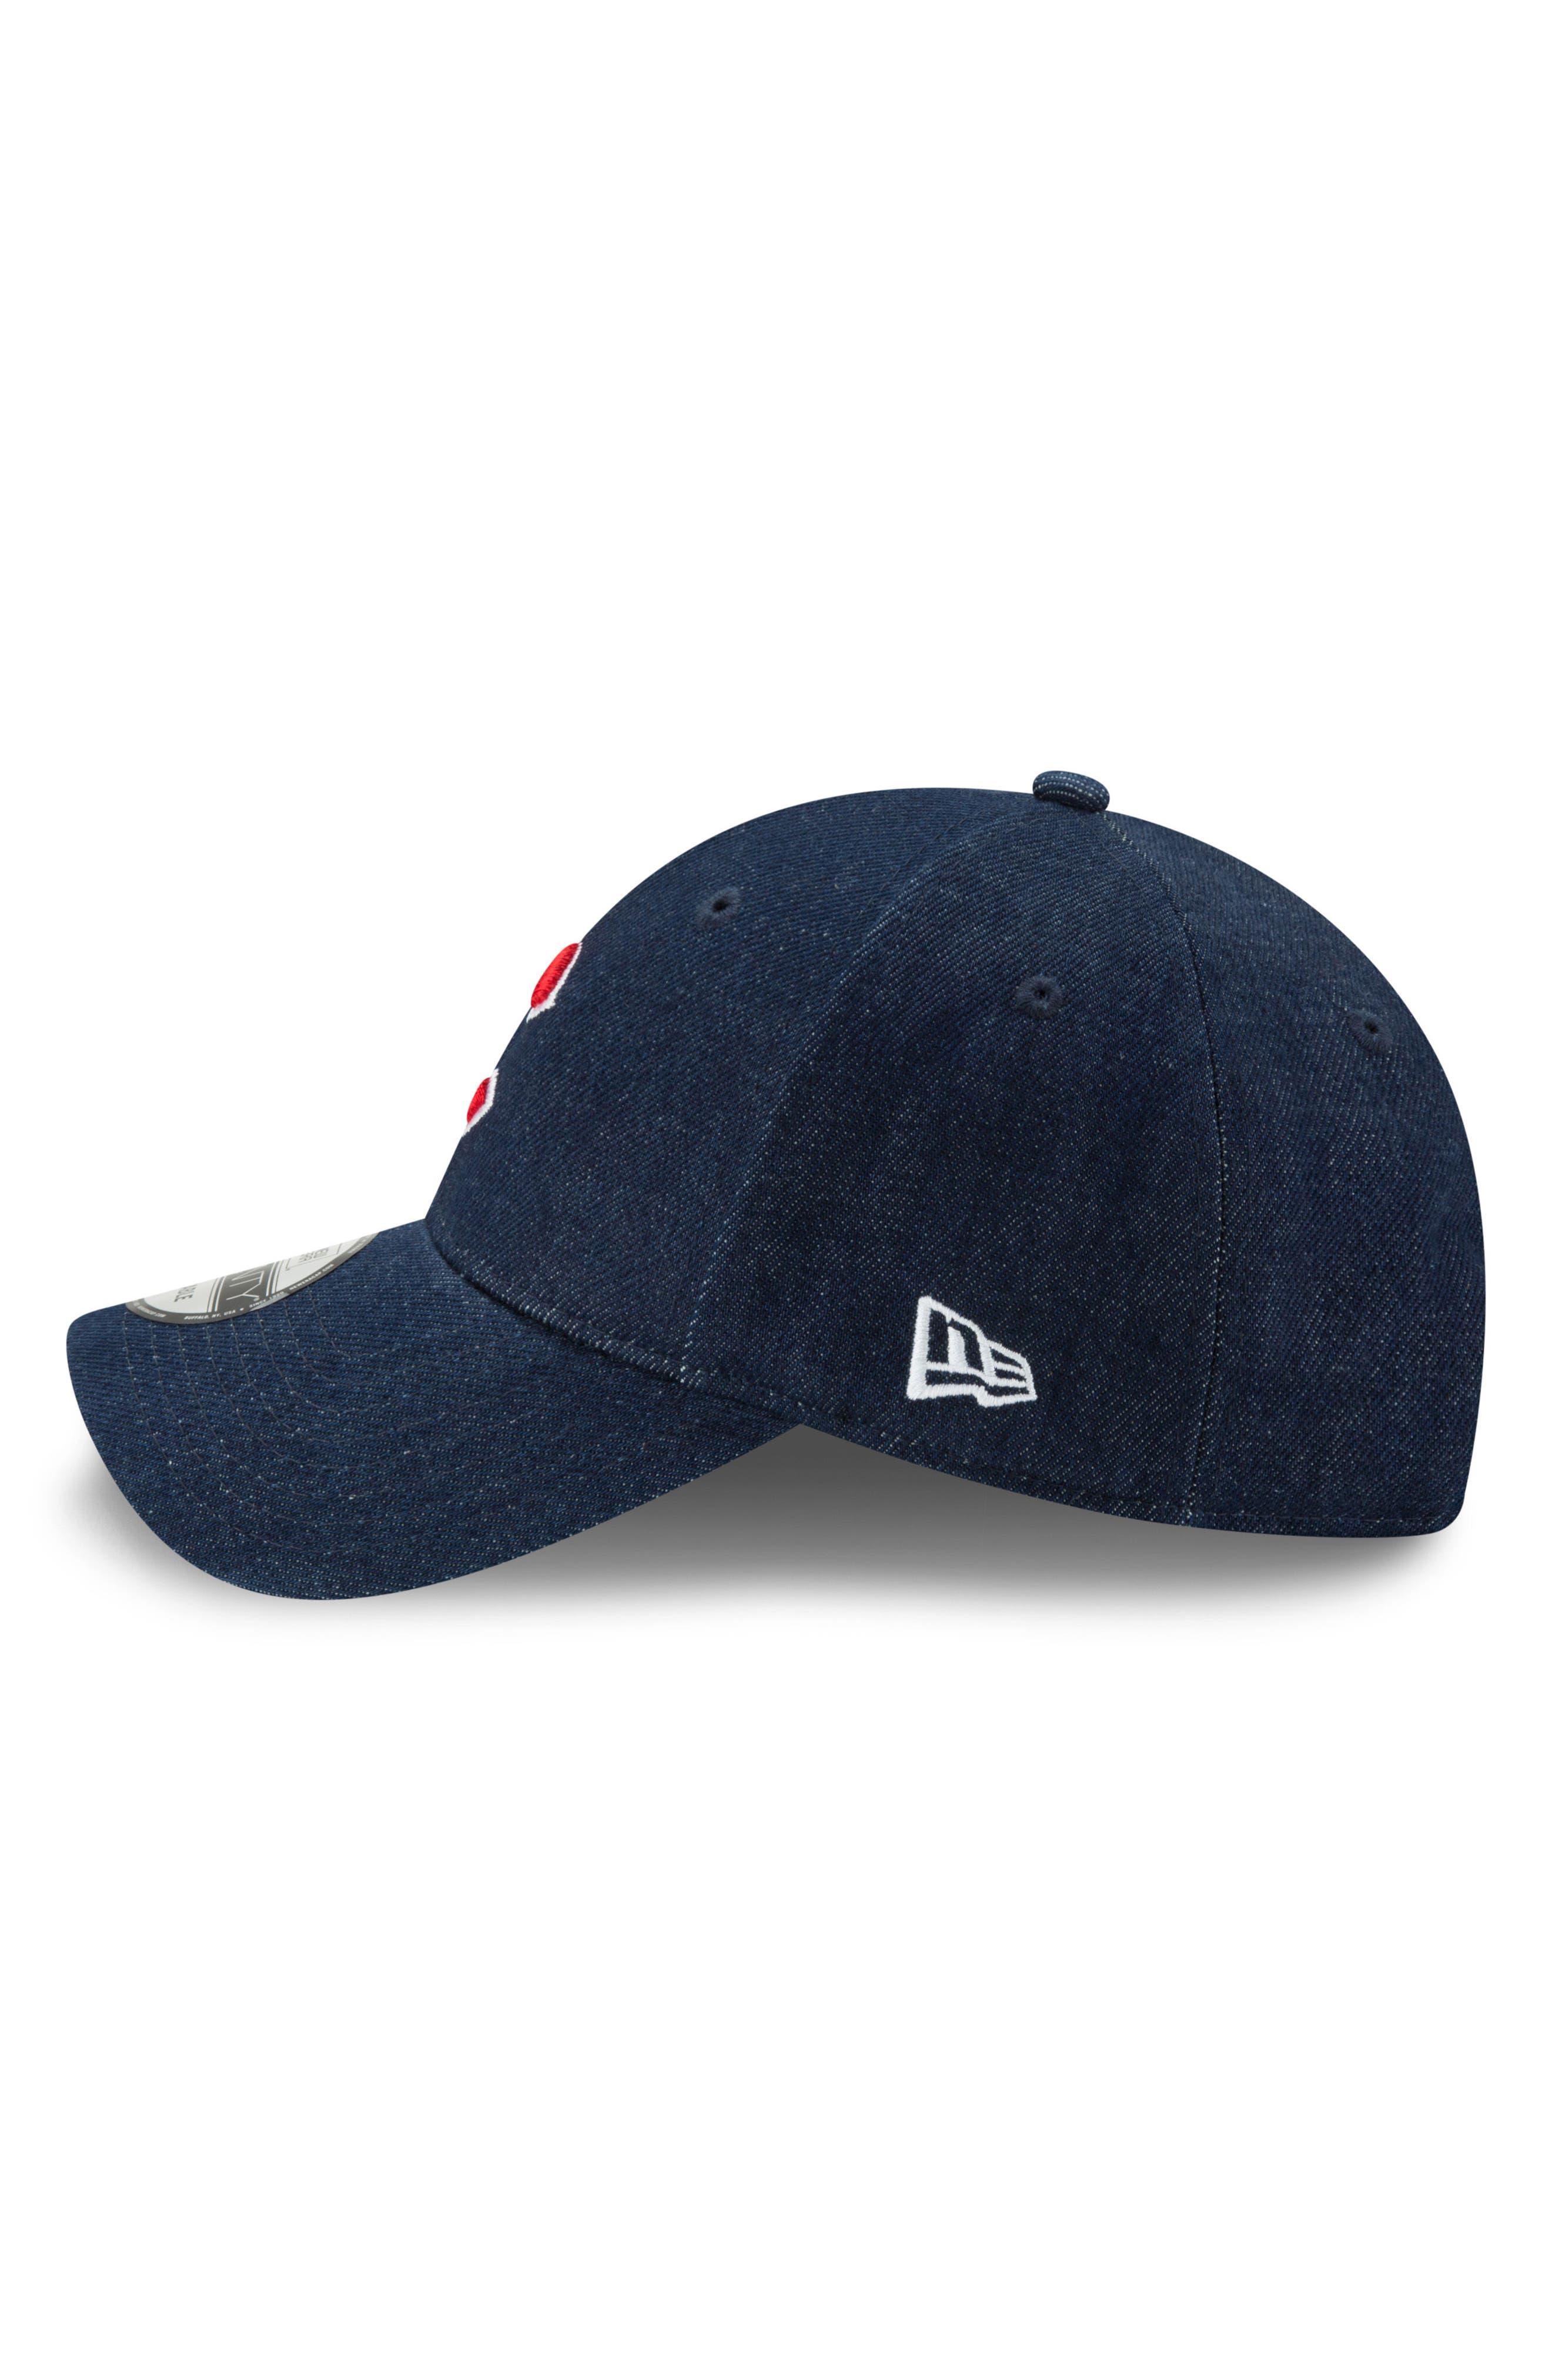 x Levi's<sup>®</sup> Dark Wash Baseball CAp,                             Alternate thumbnail 3, color,                             CHICAGO CUBS